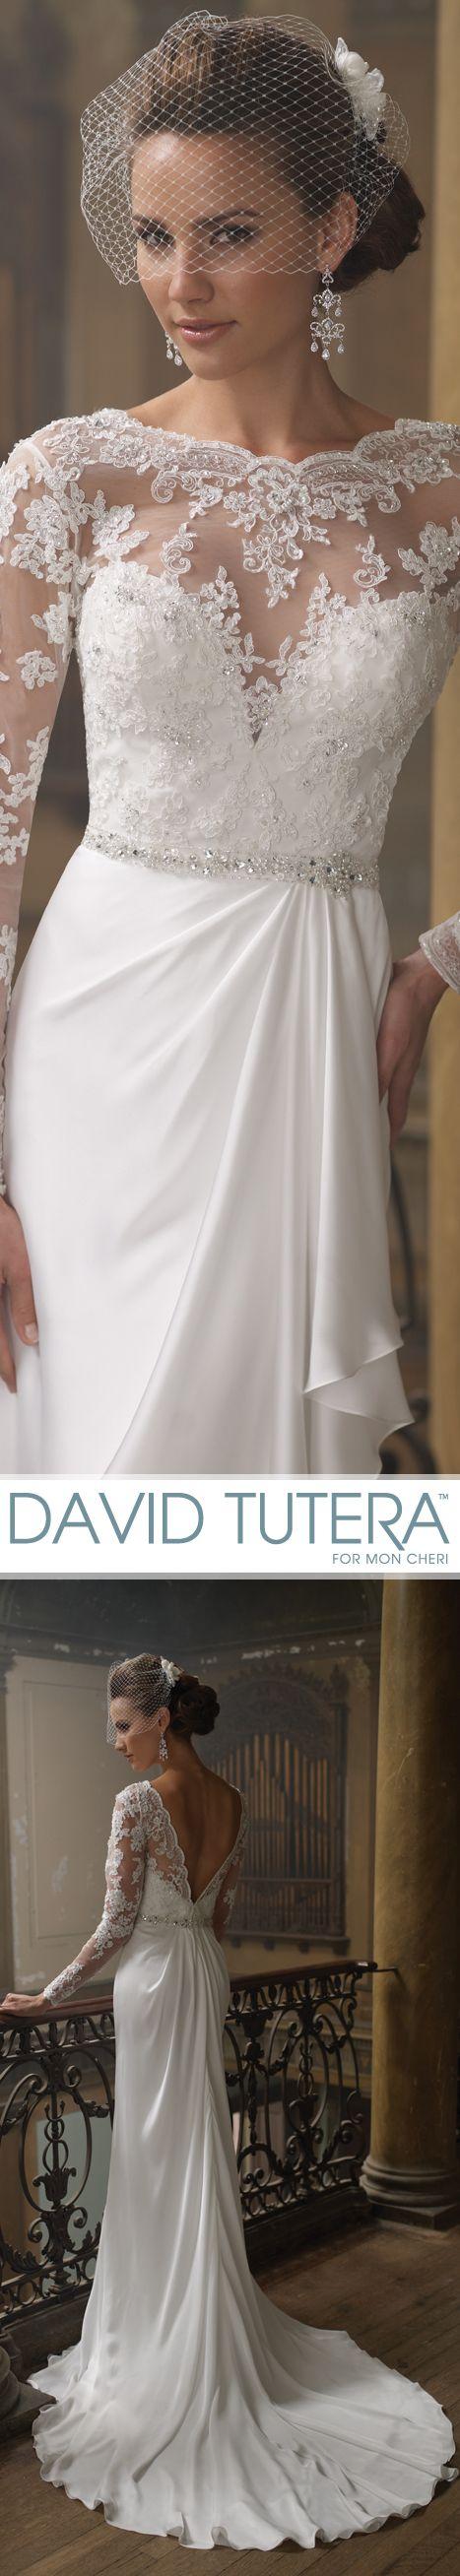 Wedding dress sheath draped skirt and wedding dress 2013 for No back wedding dress